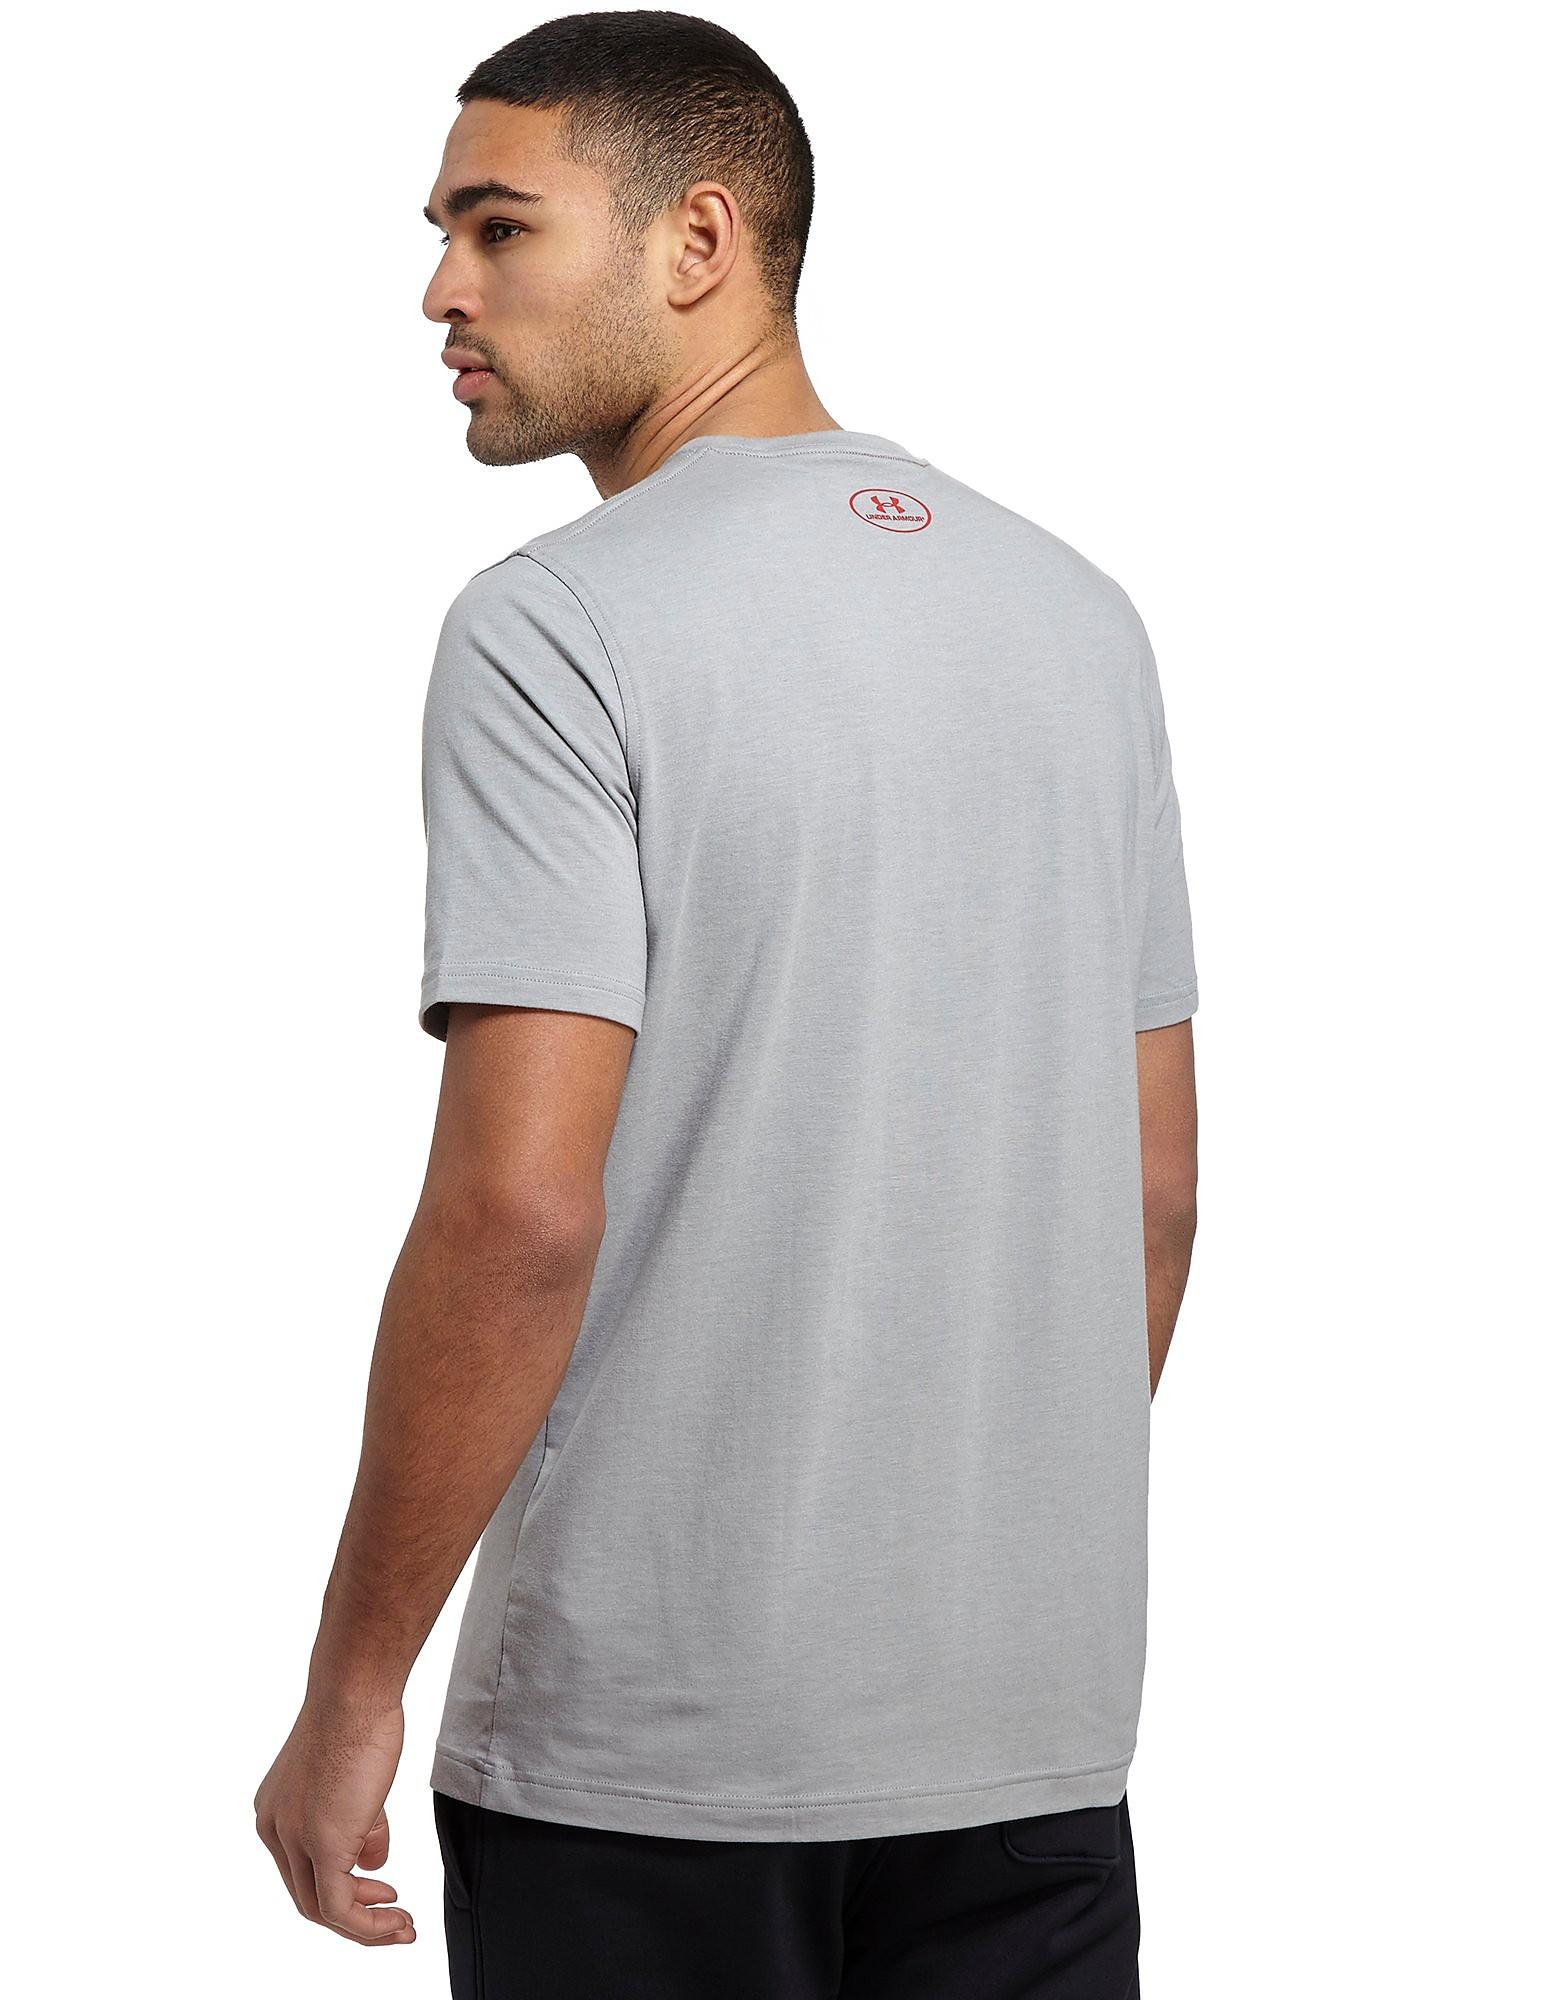 Under Armour T-shirt CC